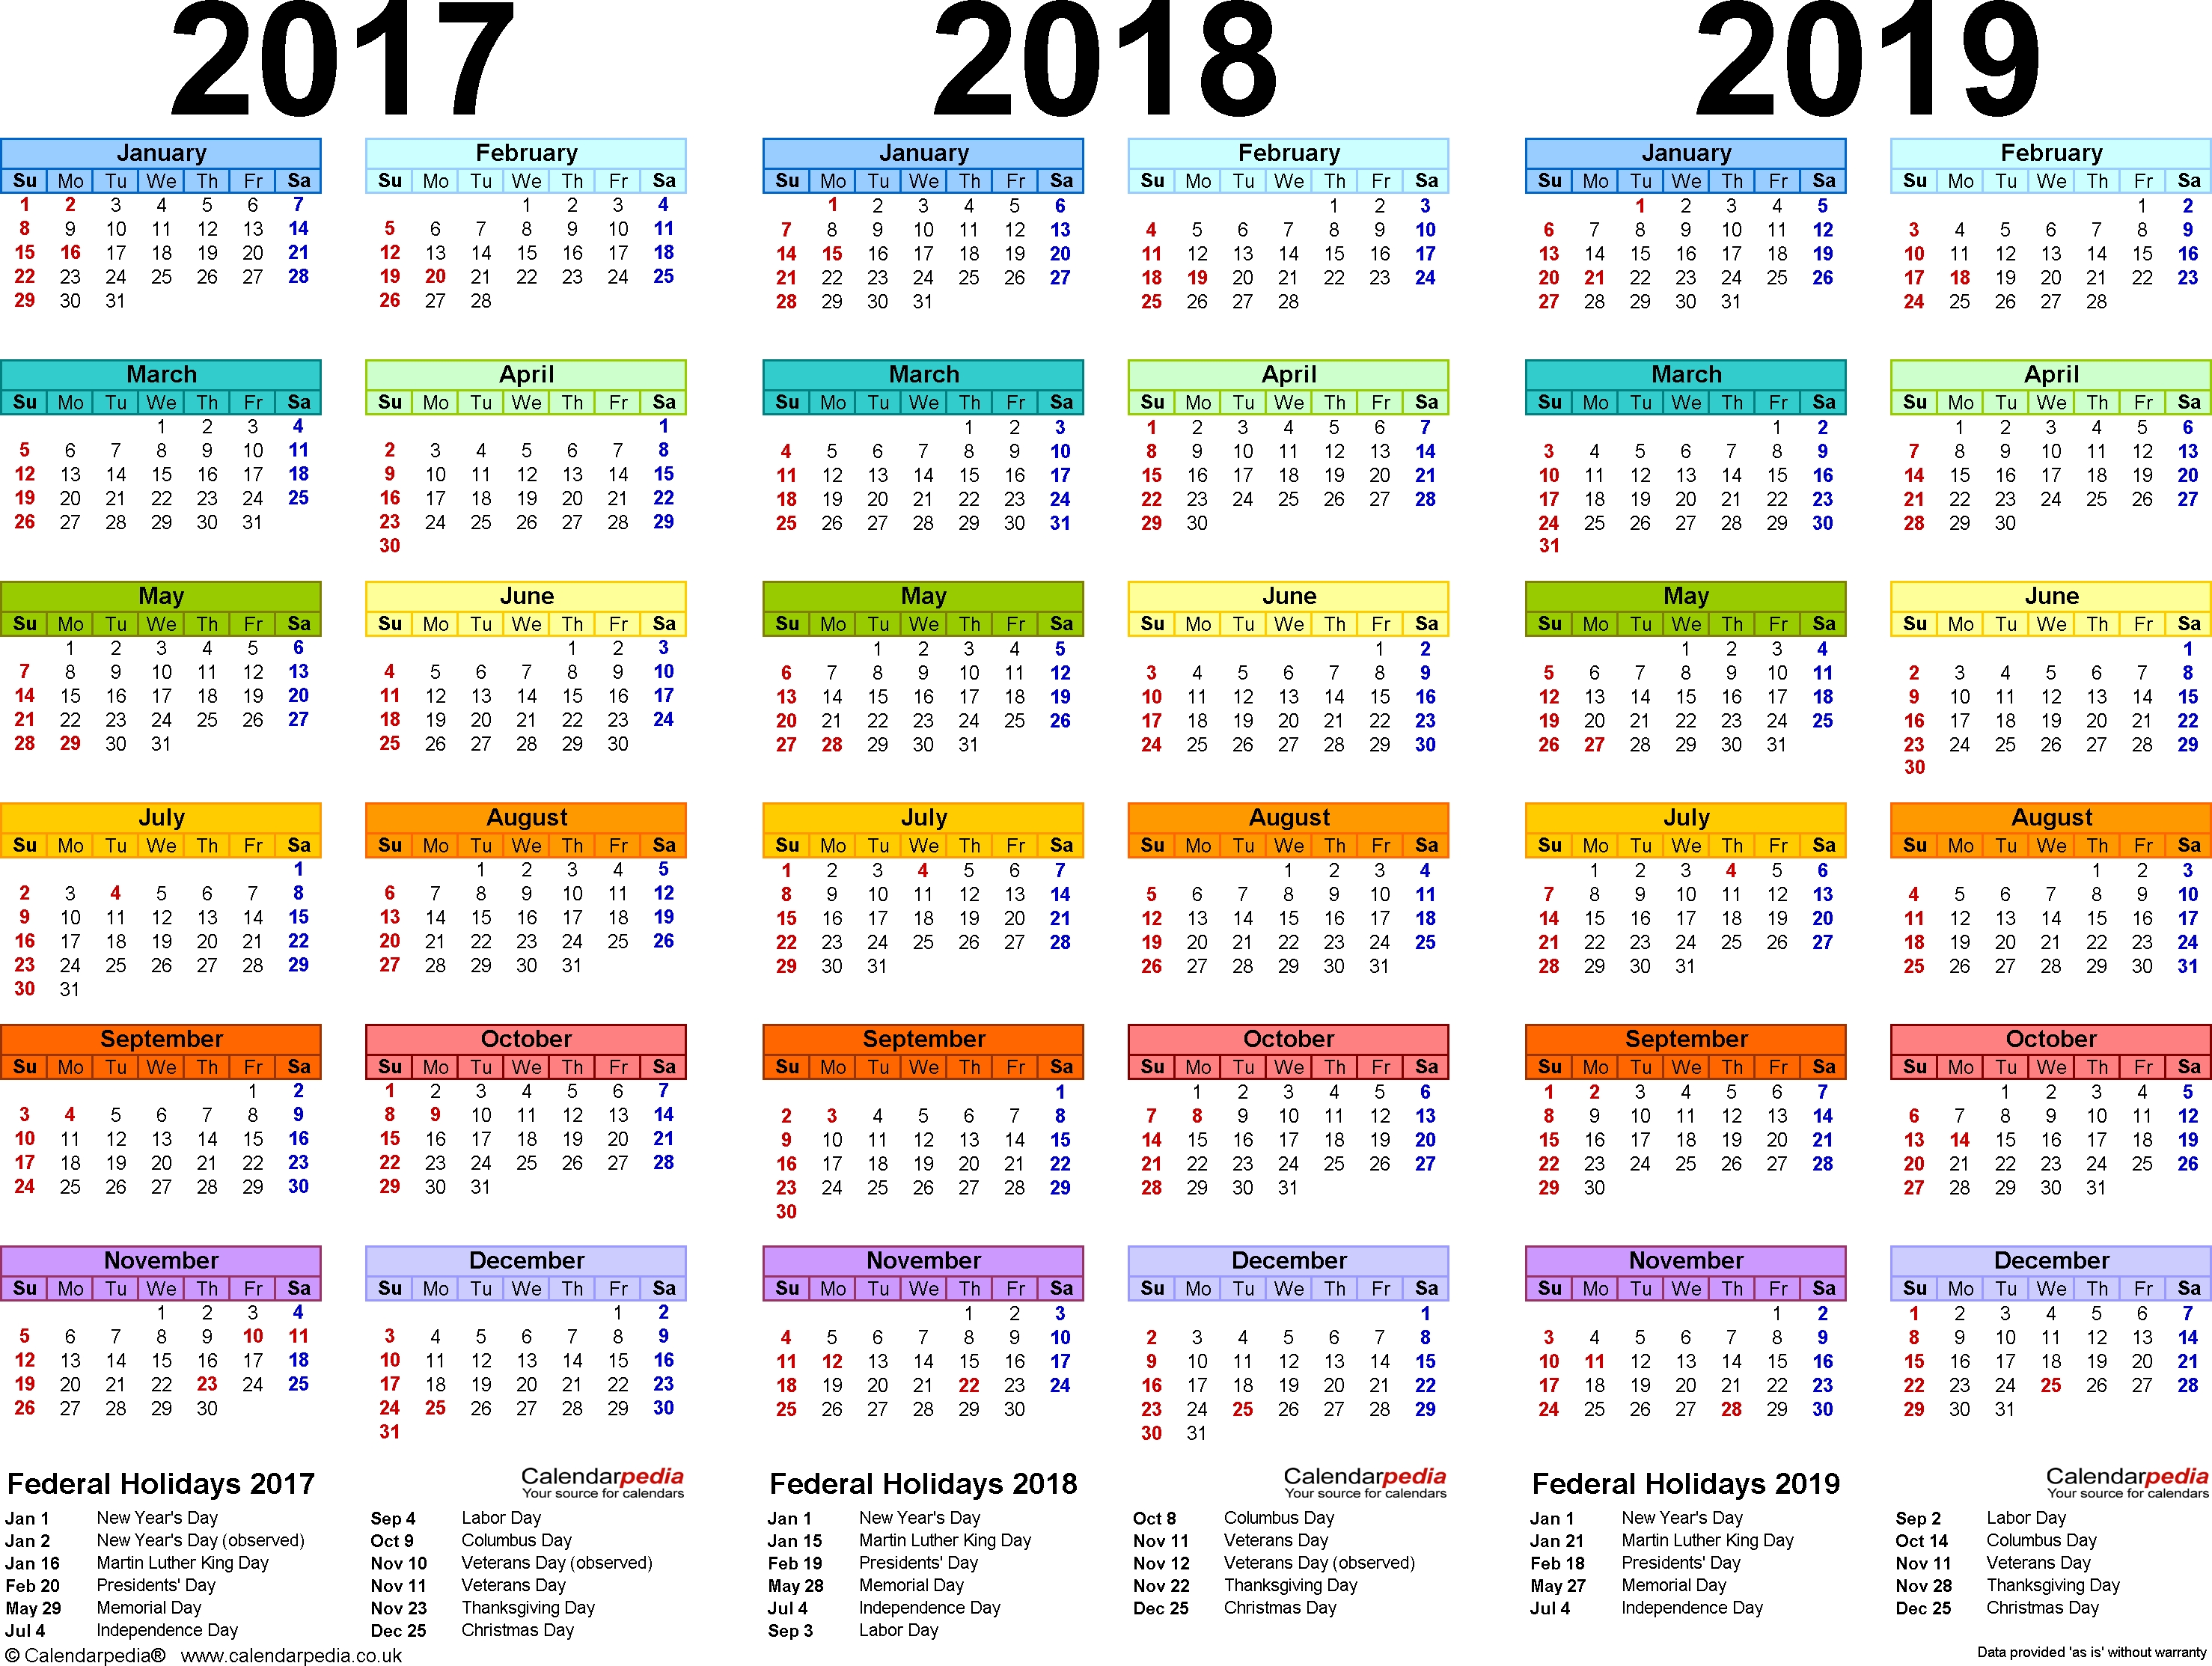 Template 1: Pdf Template For Three Year Calendar 2017/2018/2019